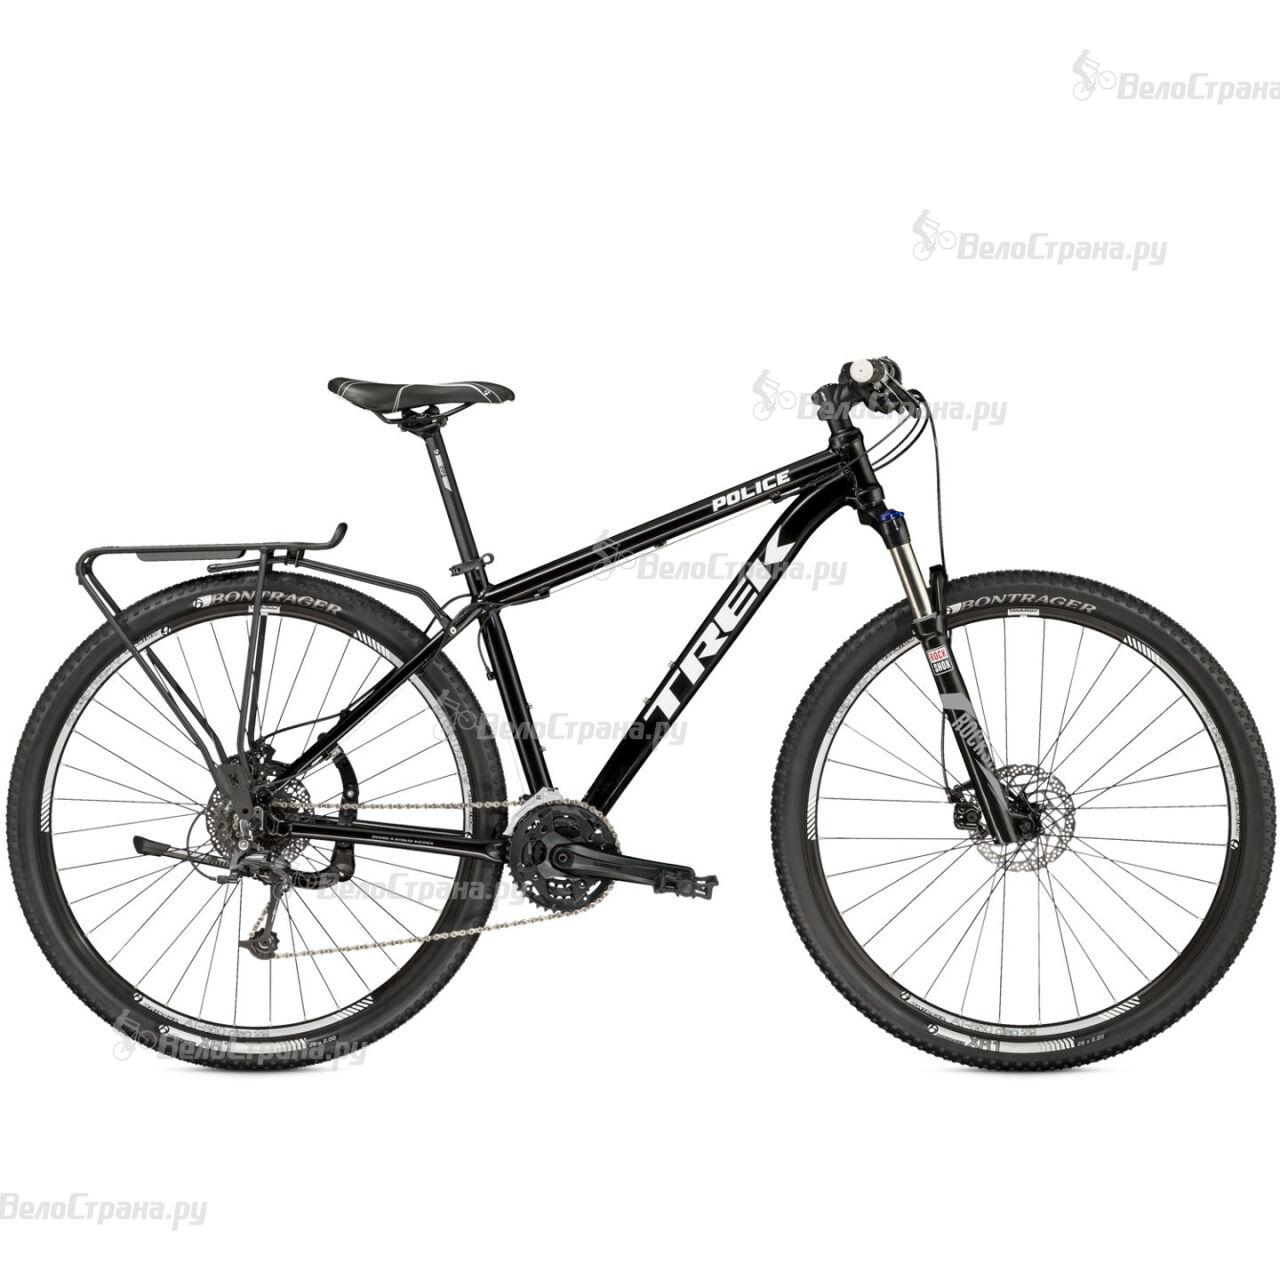 Велосипед Trek Police 29er (2017)